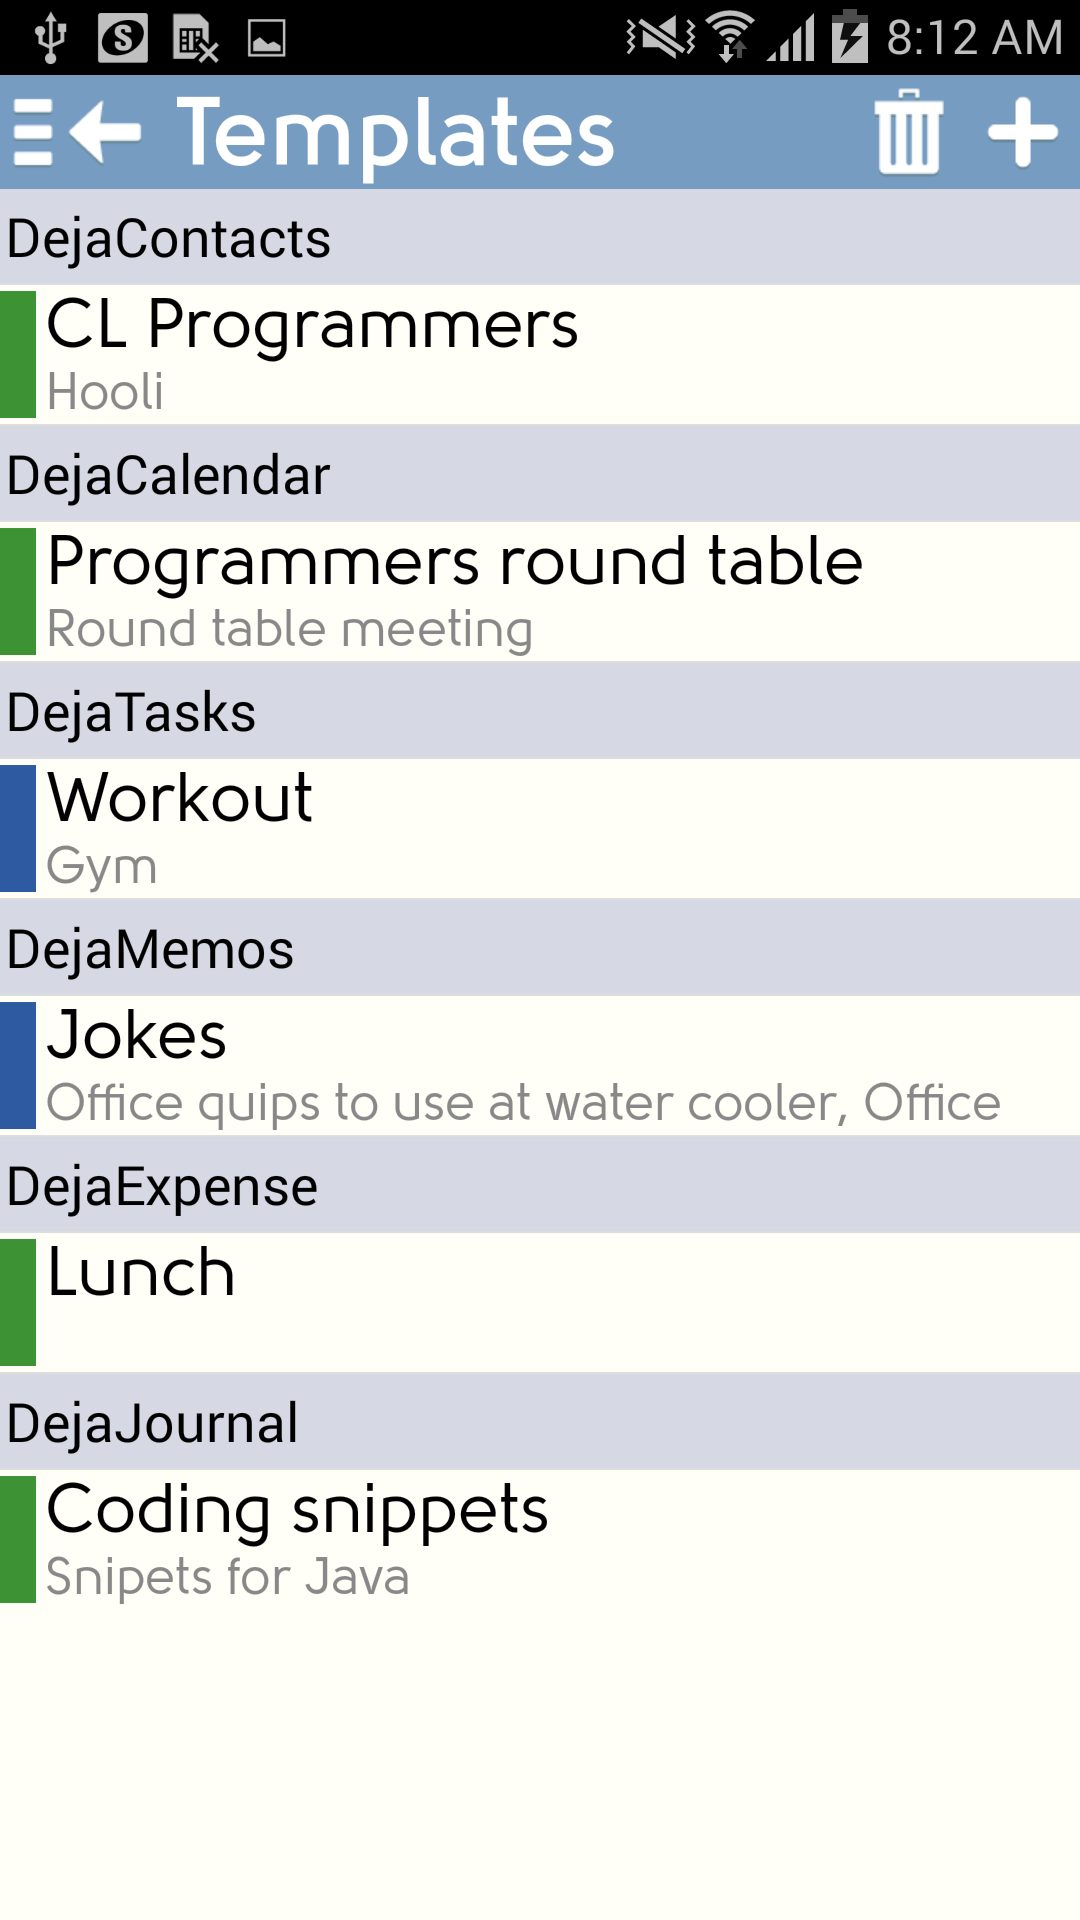 DejaOffice Classroom - Android - Templates